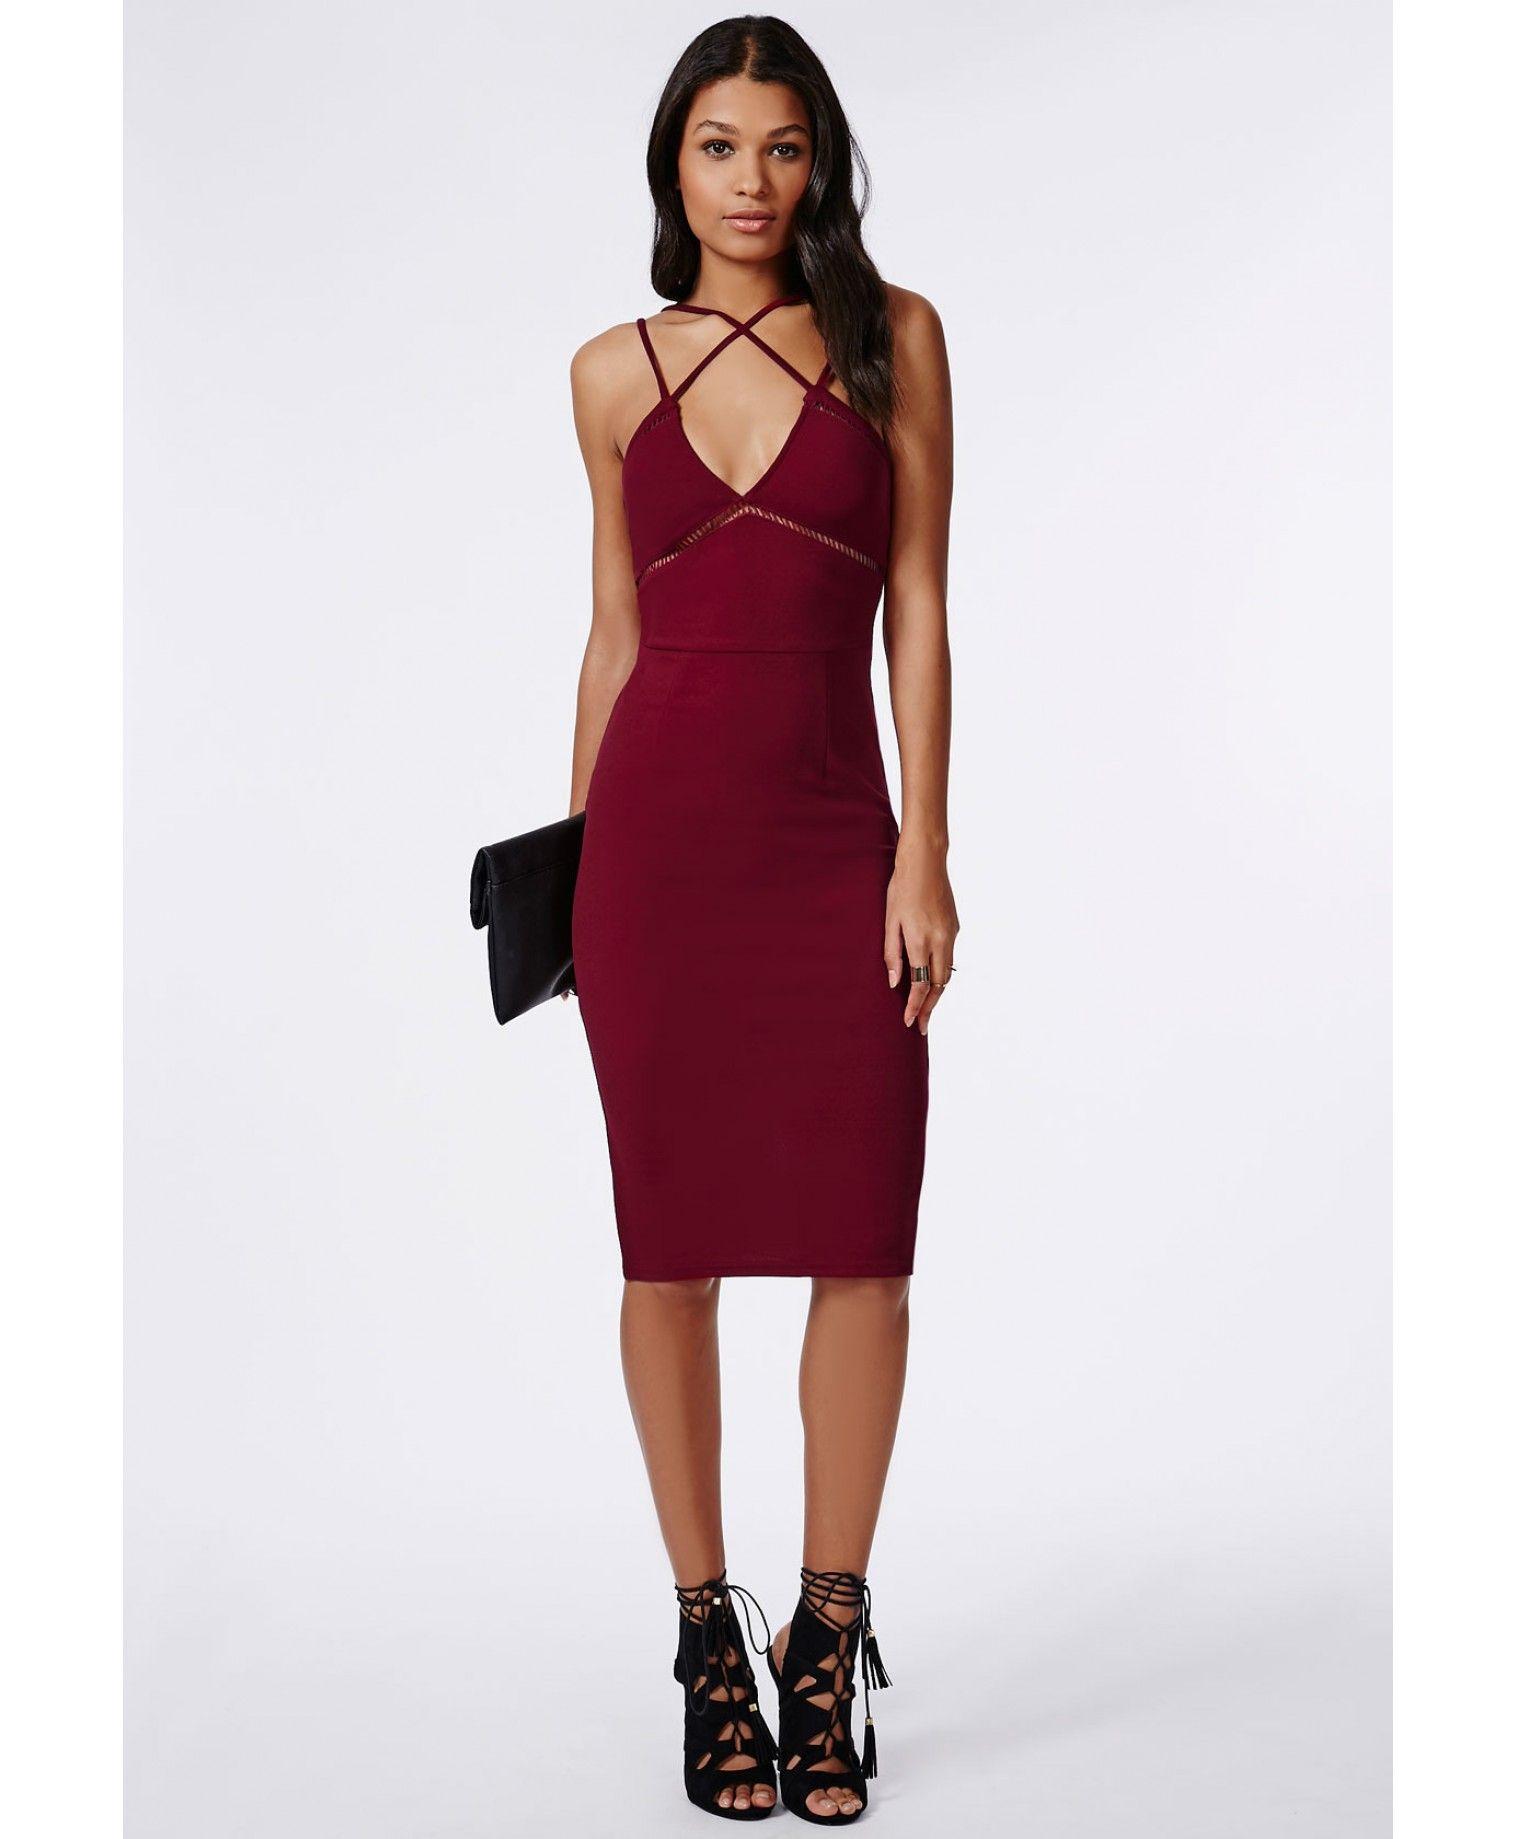 6713a8b2354b Christina Crepe Ladder Detail Midi Dress Burgundy - Dresses - Midi Dresses  - Missguided